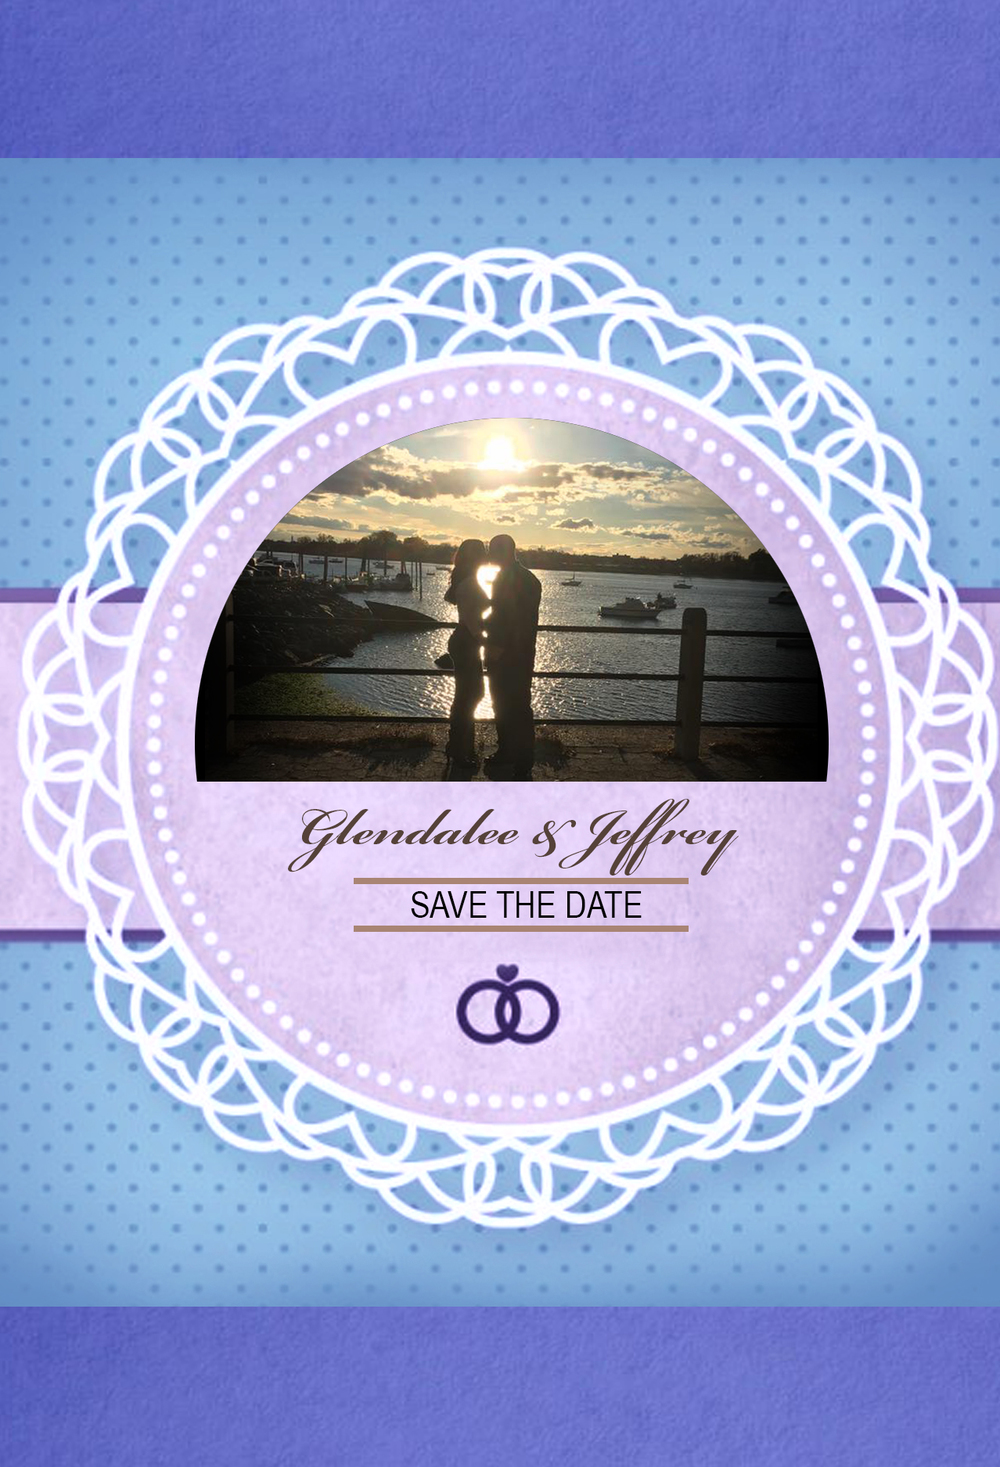 FRONT 4x6 GLEN JEFF WEDDING INVITE DEC 4 2015.jpg